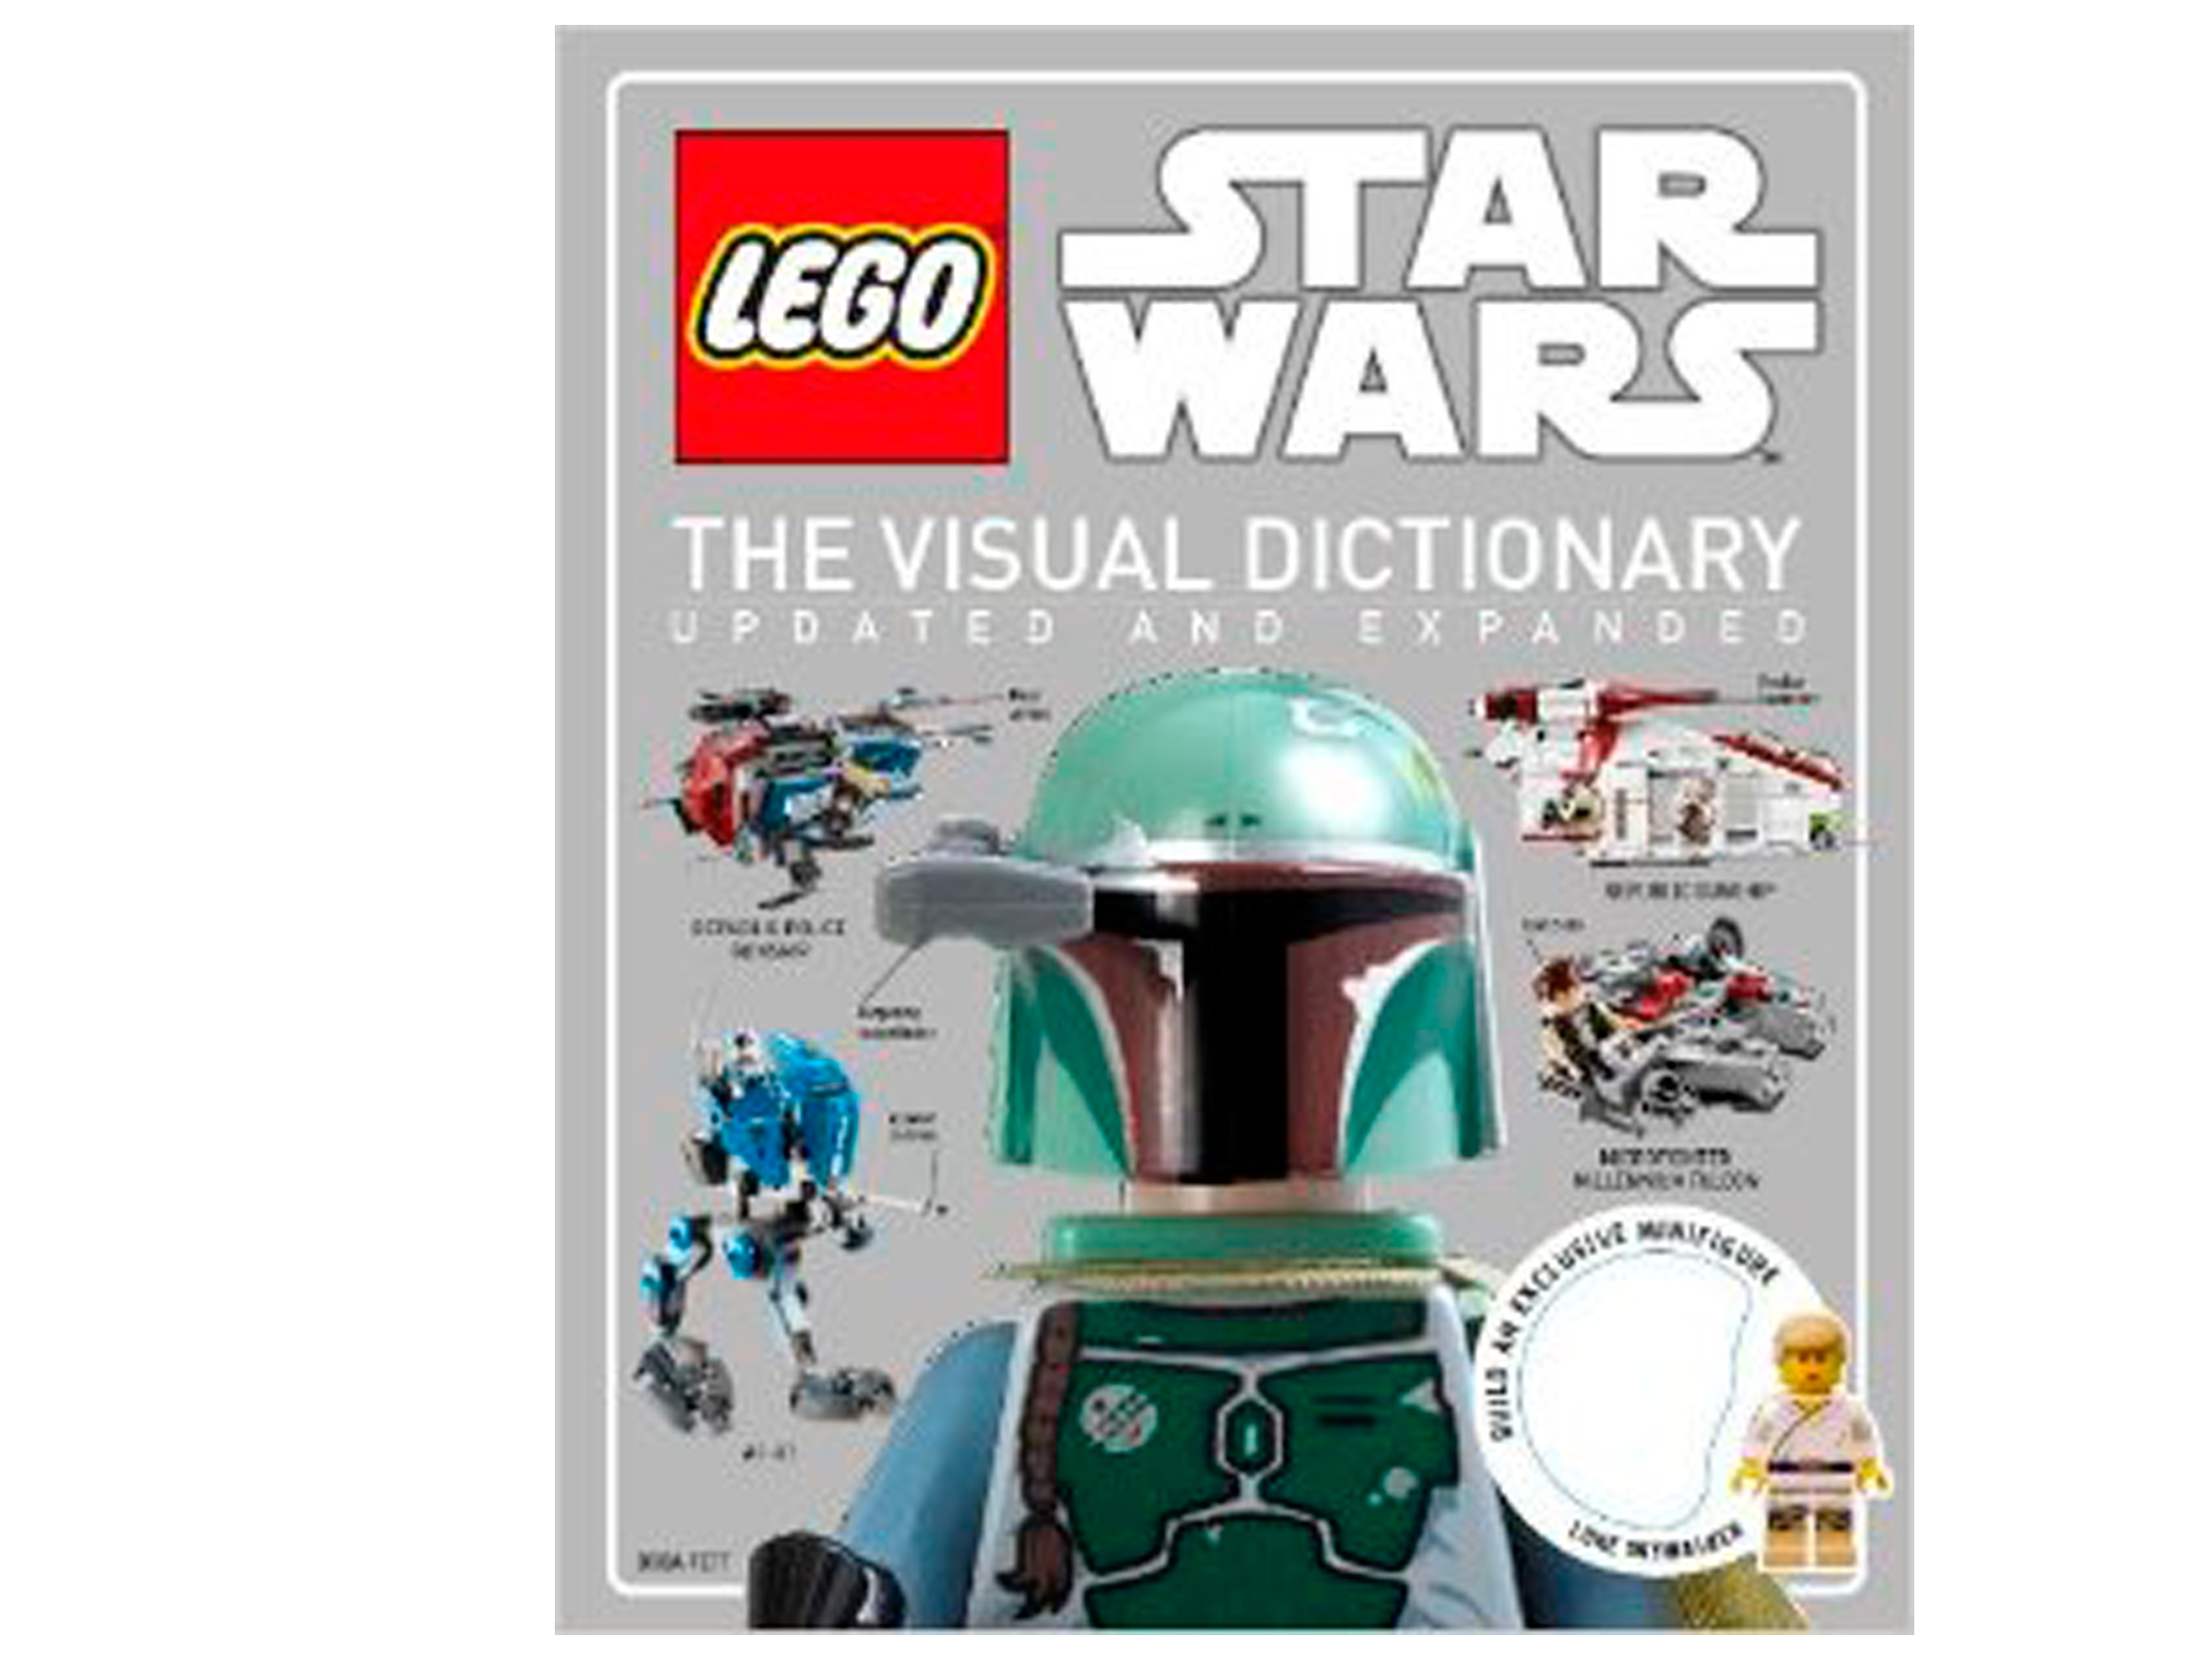 Original Lego Star Wars Darth Vader StormTrooper School Backpack